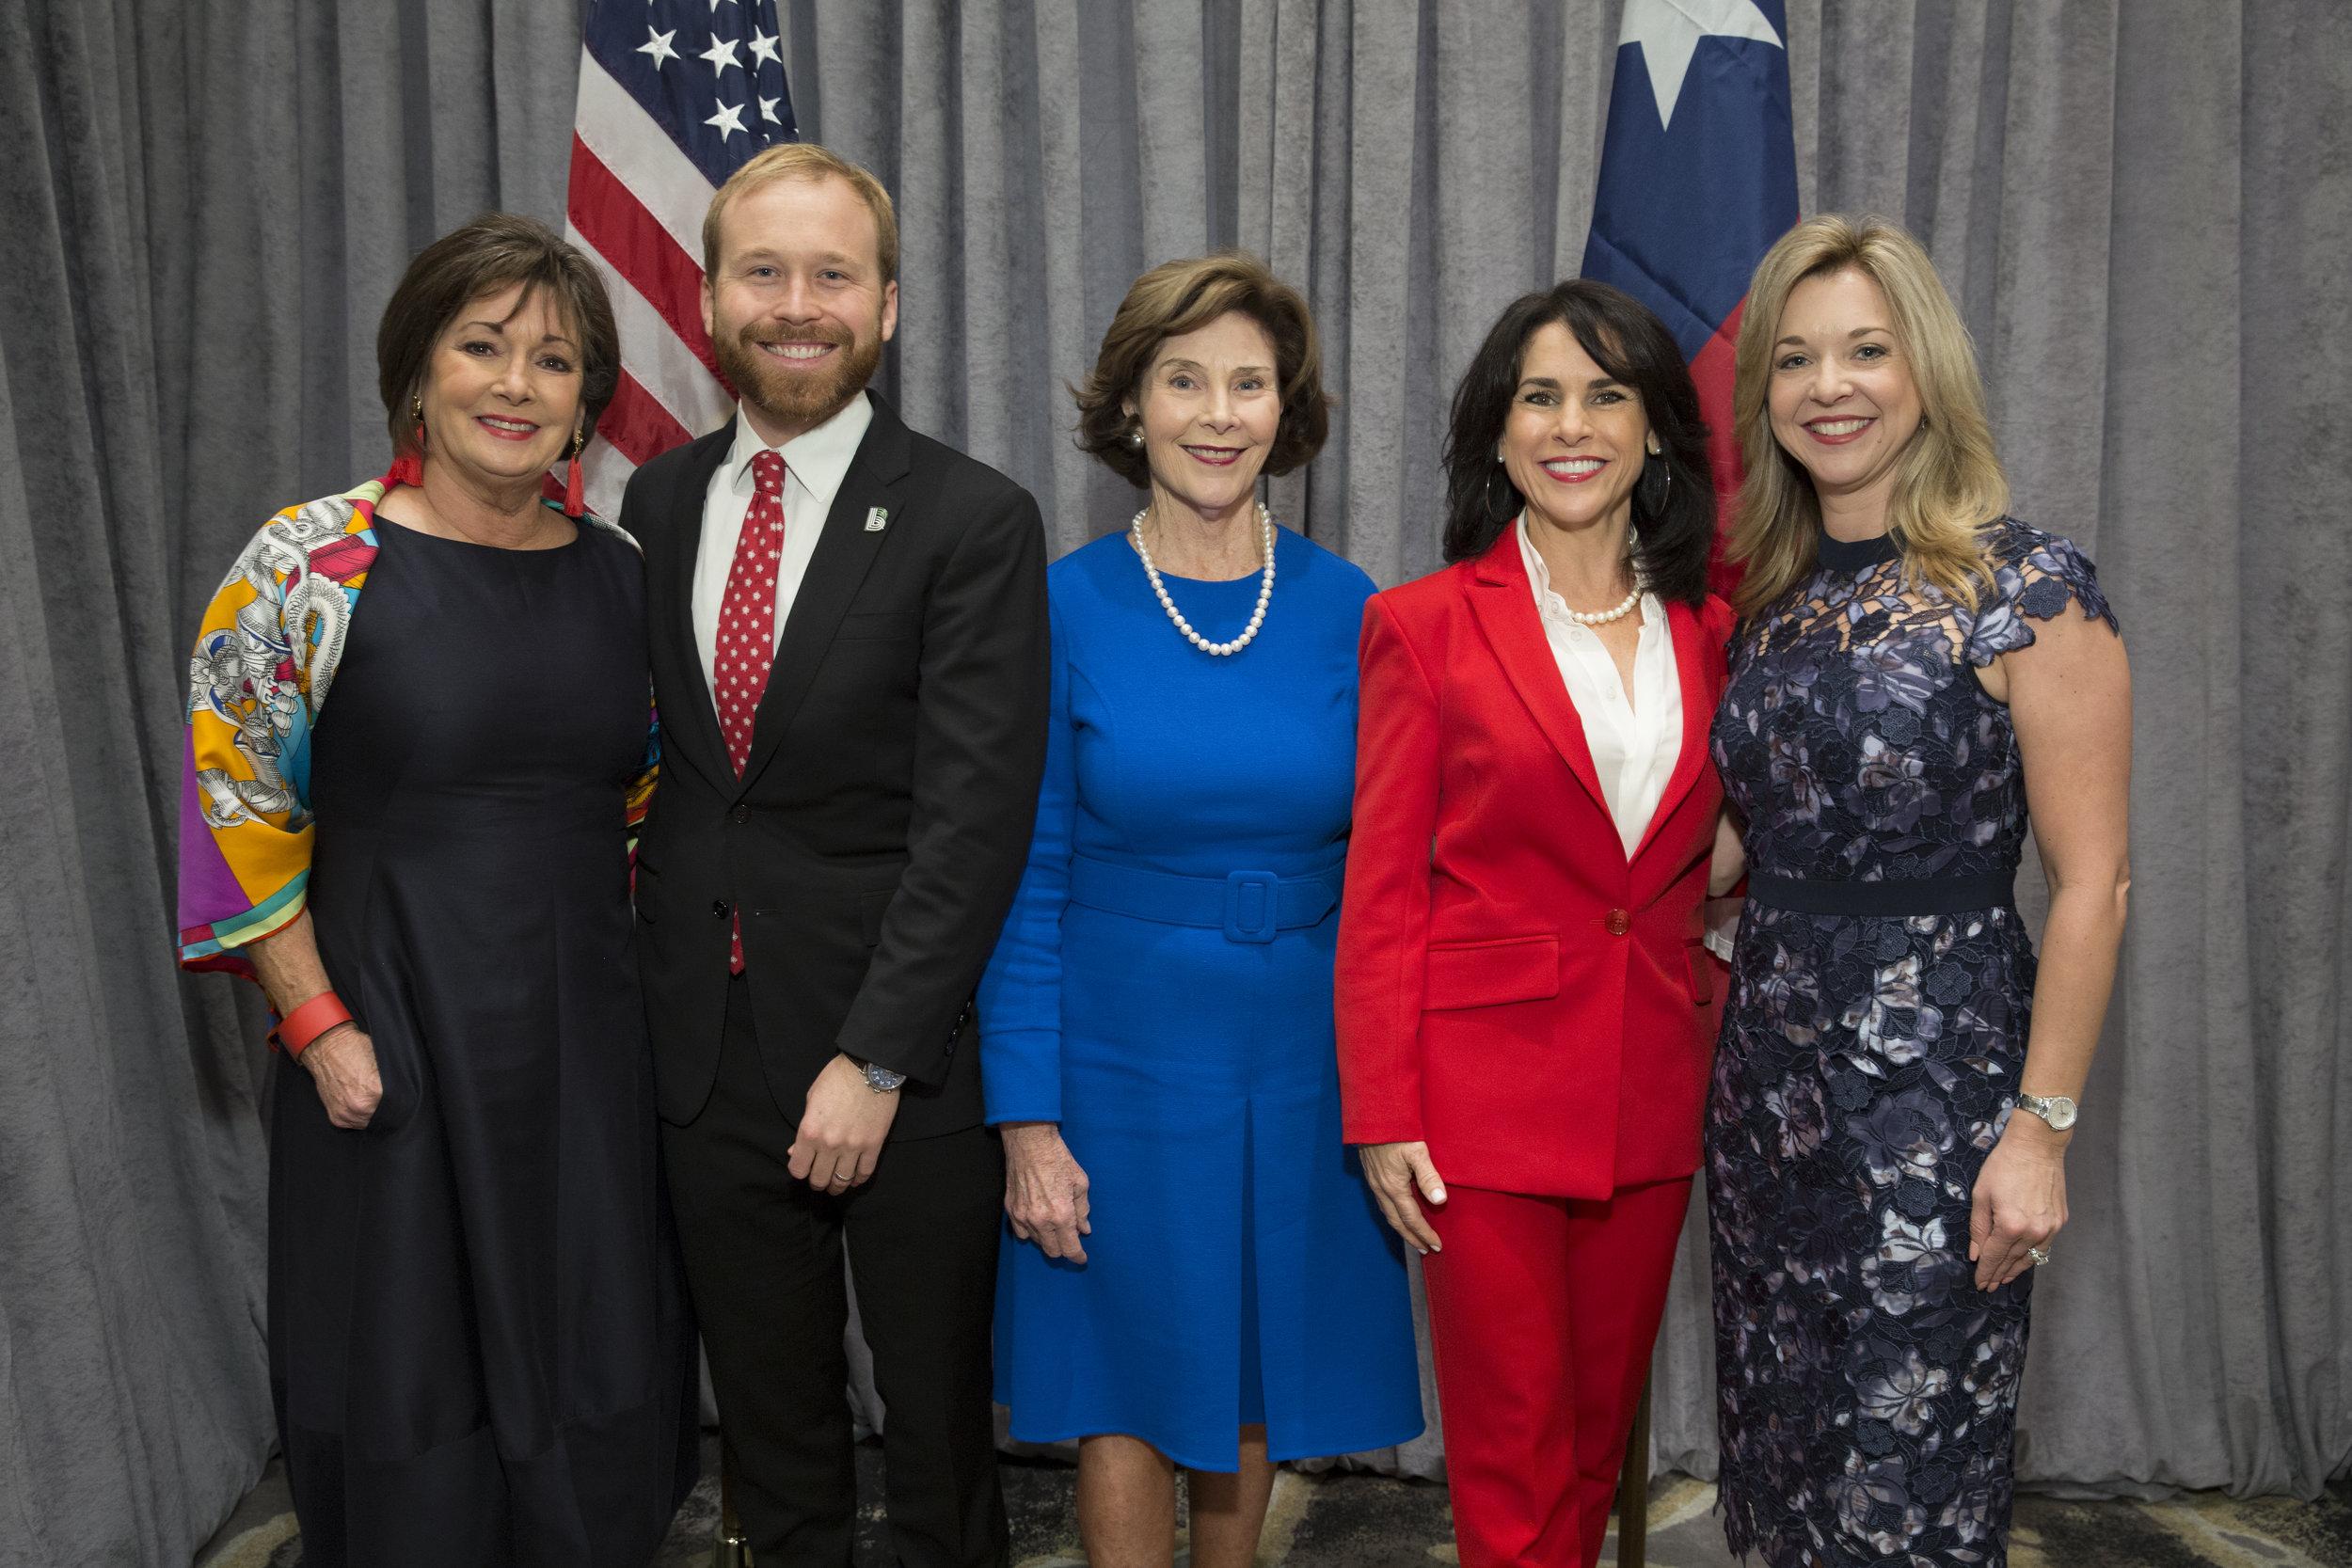 Cathy Cleary, Pierce Bush, Laura Bush, Maria Bush, Julie Baker Finck; Photo by Jenny Antill.jpg